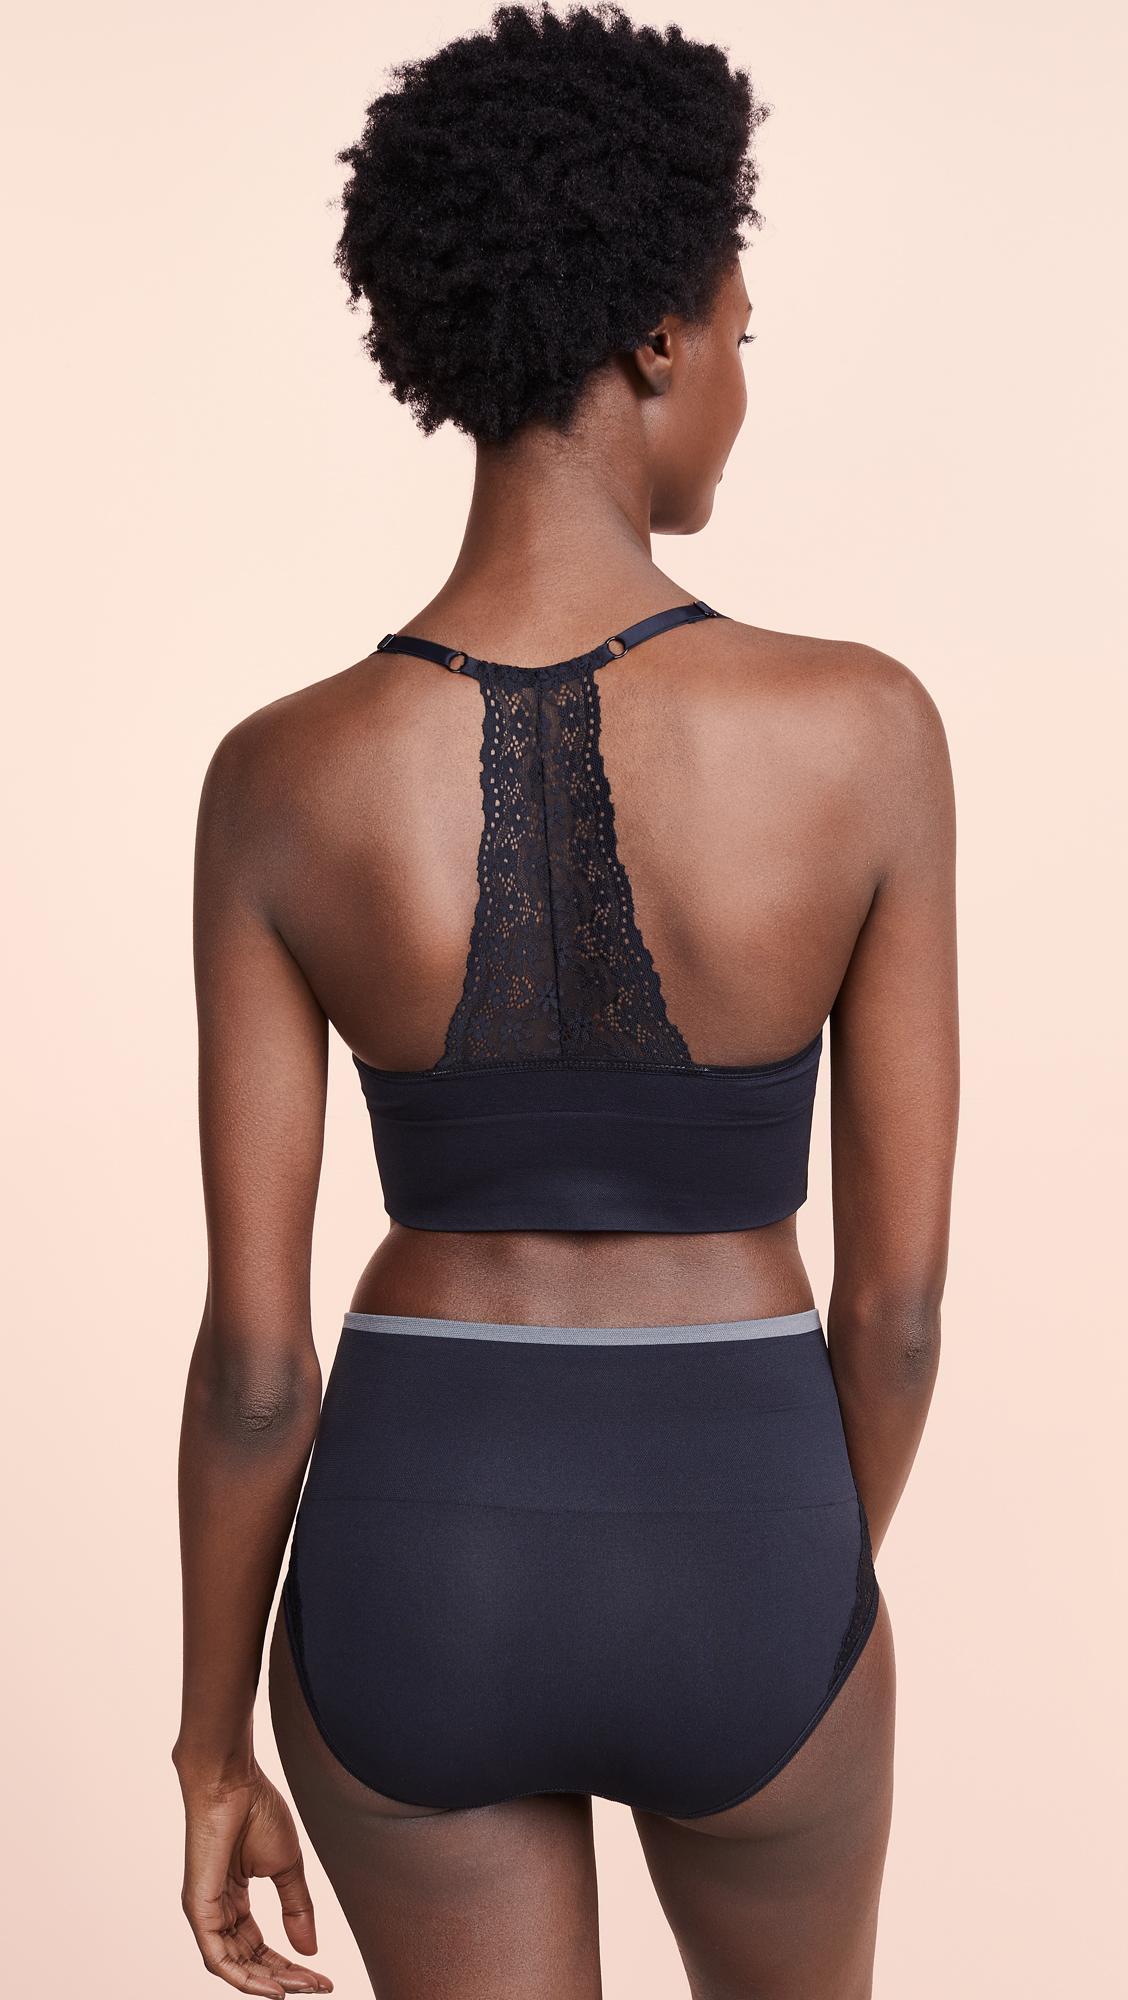 6667a79fb9 Yummie - Black Ultralight Seamless Lace Back Bralette - Lyst. View  fullscreen